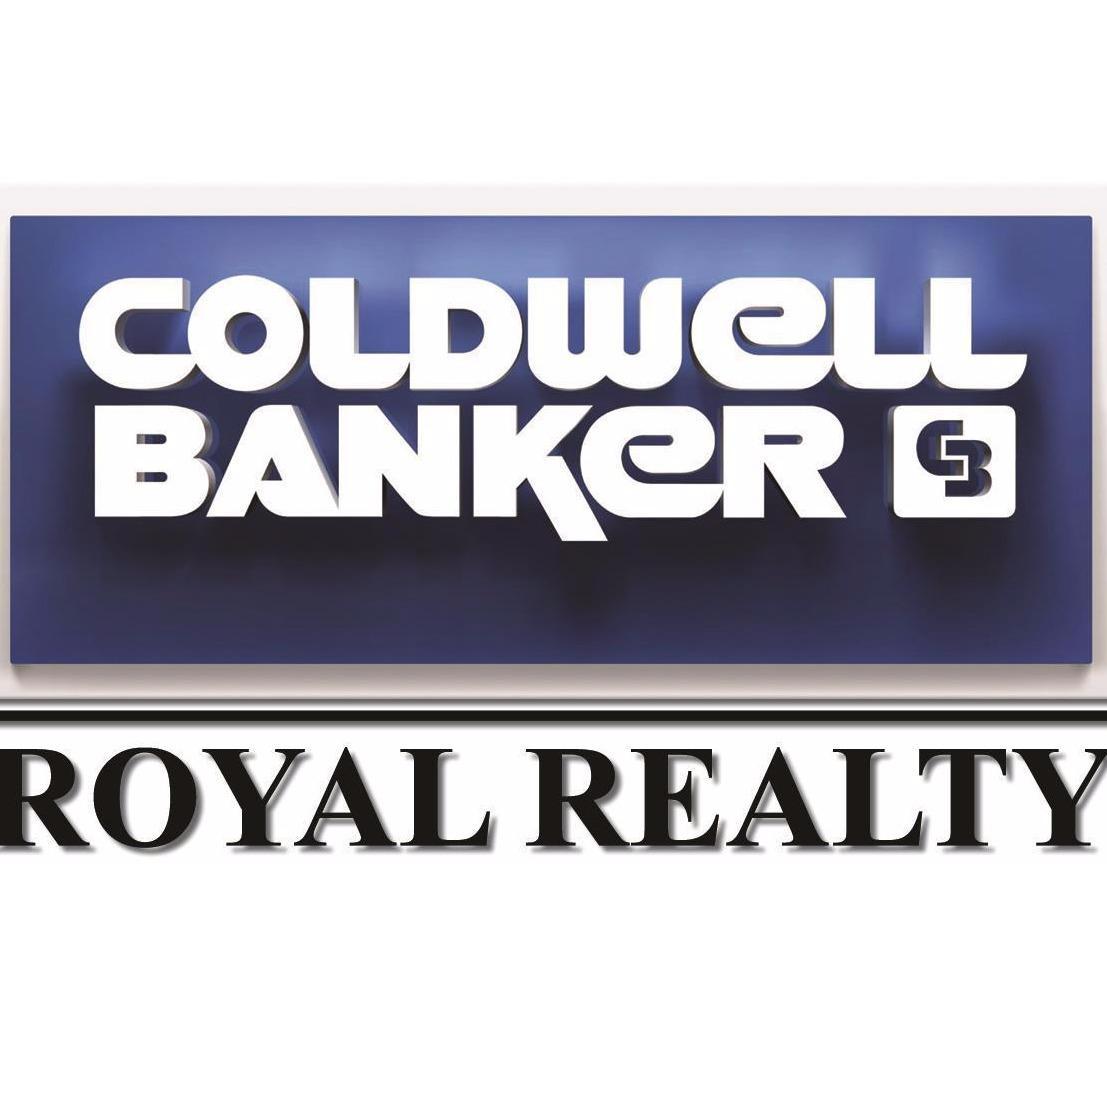 Alexandra Vinson - Coldwell Banker Royal Realty